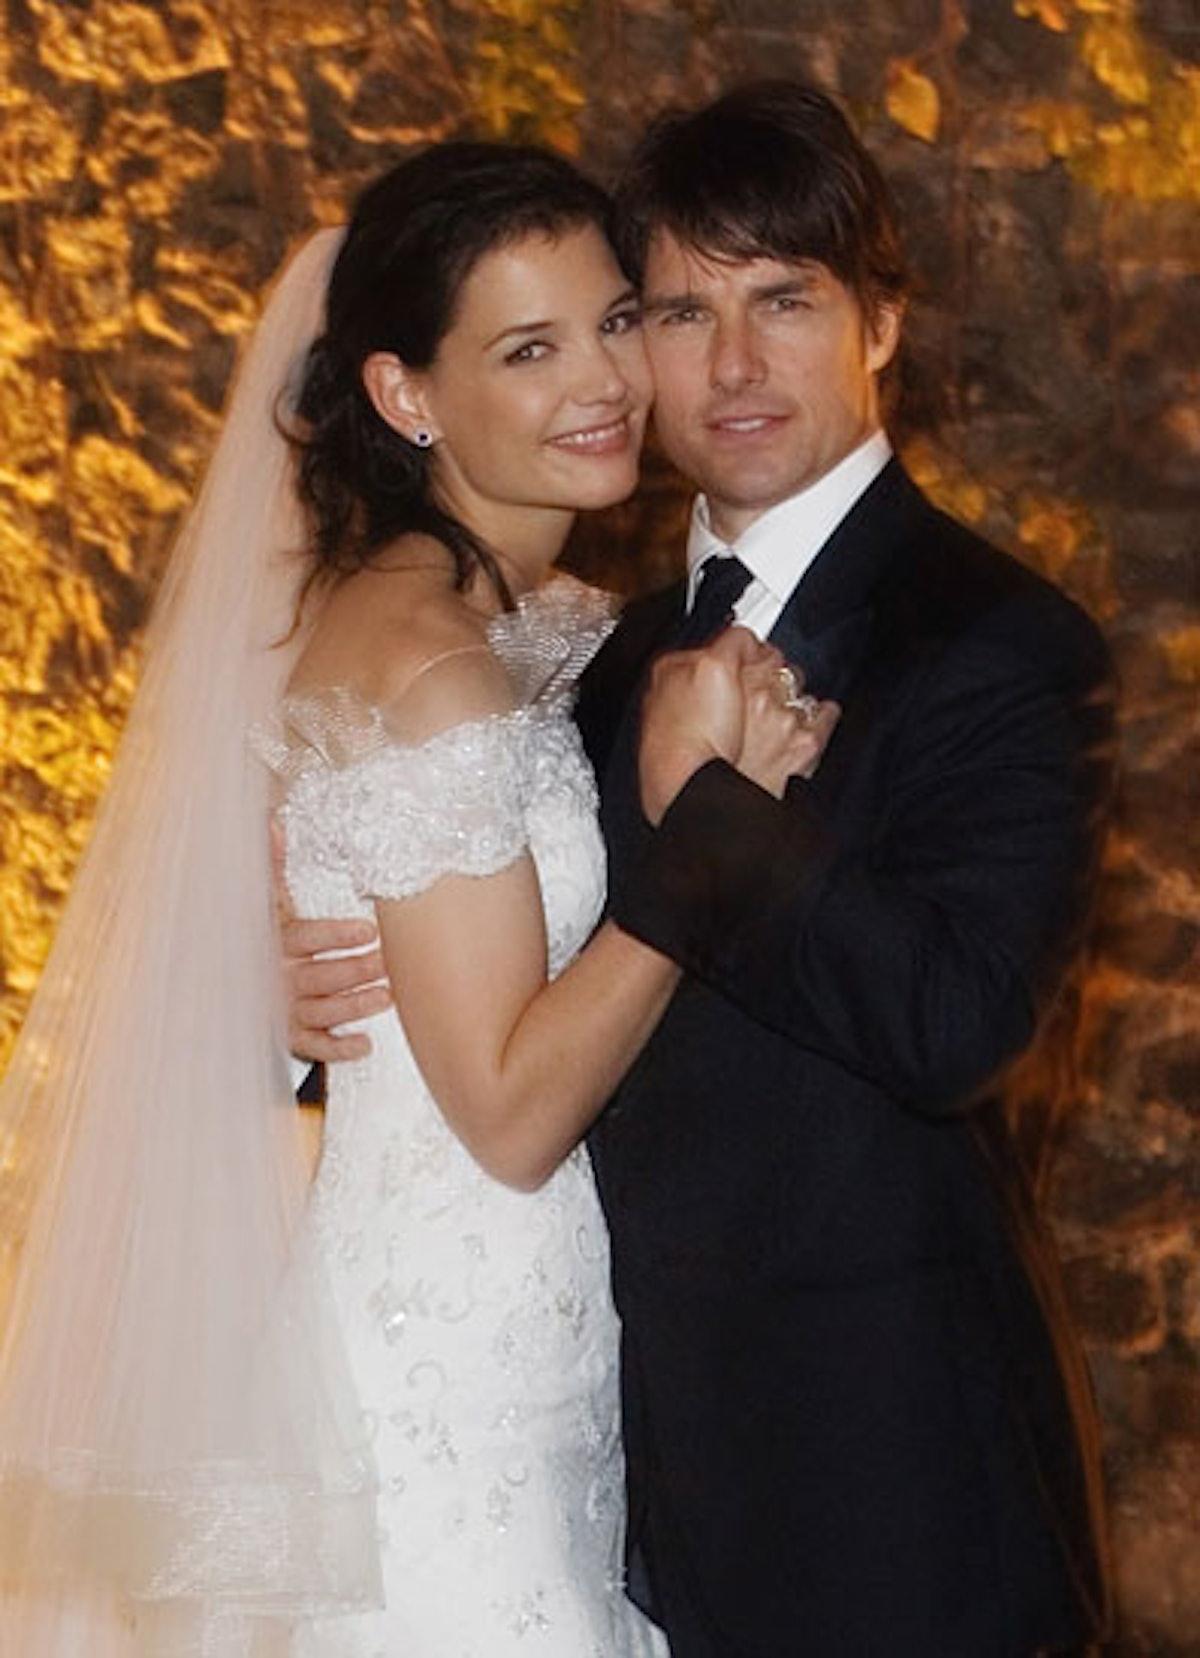 cess-outrageous-celebrity-weddings-01-v.jpg